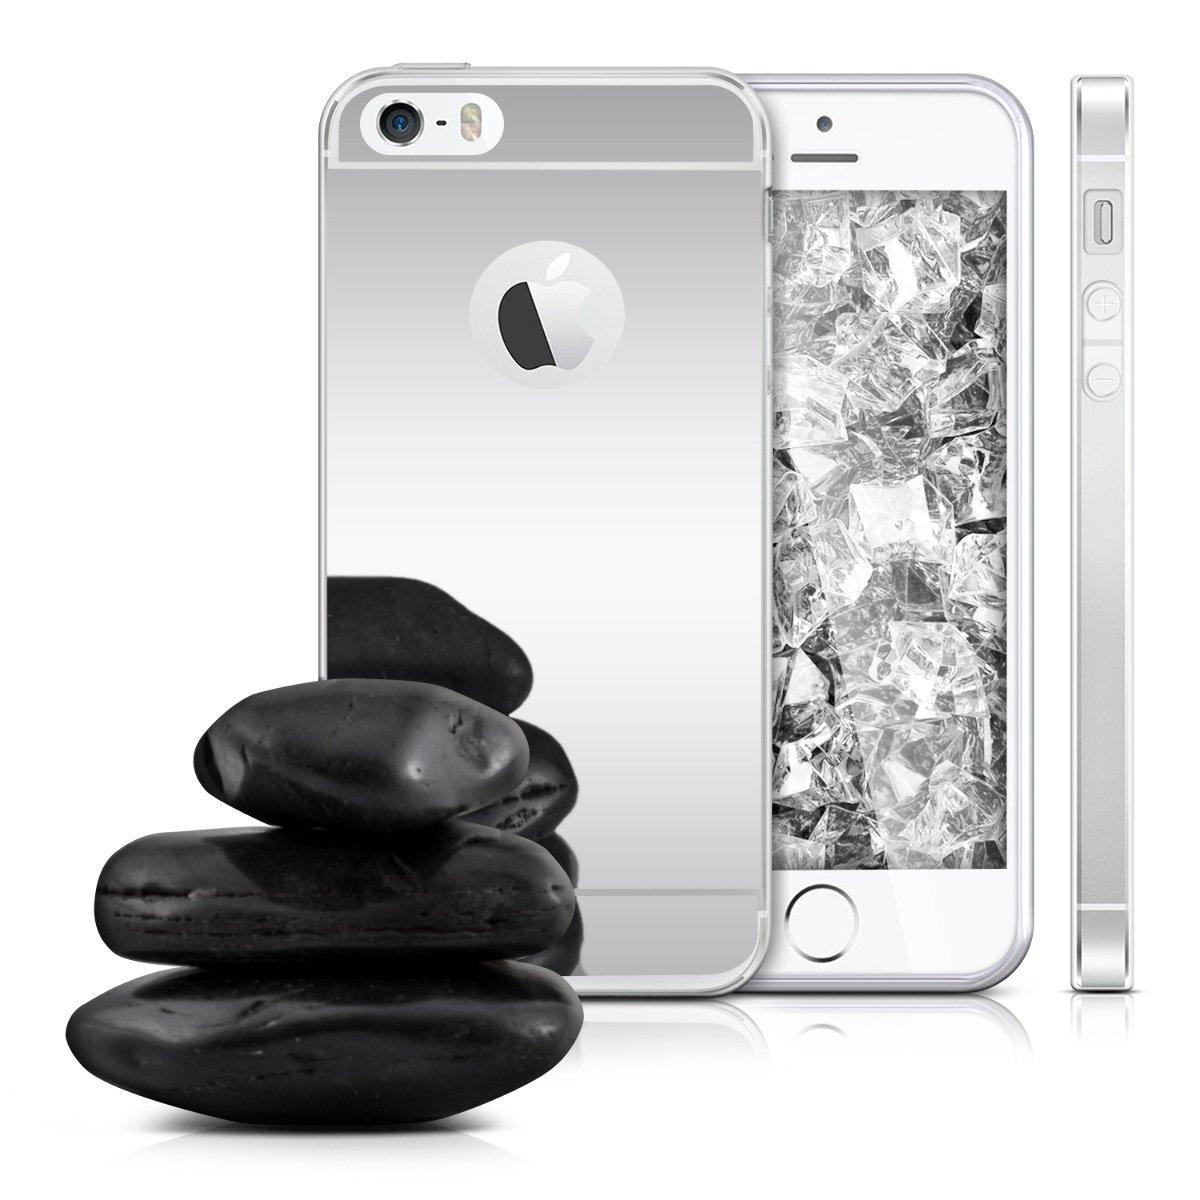 Zrcadlový kryt My Mirror pro iPhone SE / 5s / 5 - Stříbrný (silver)